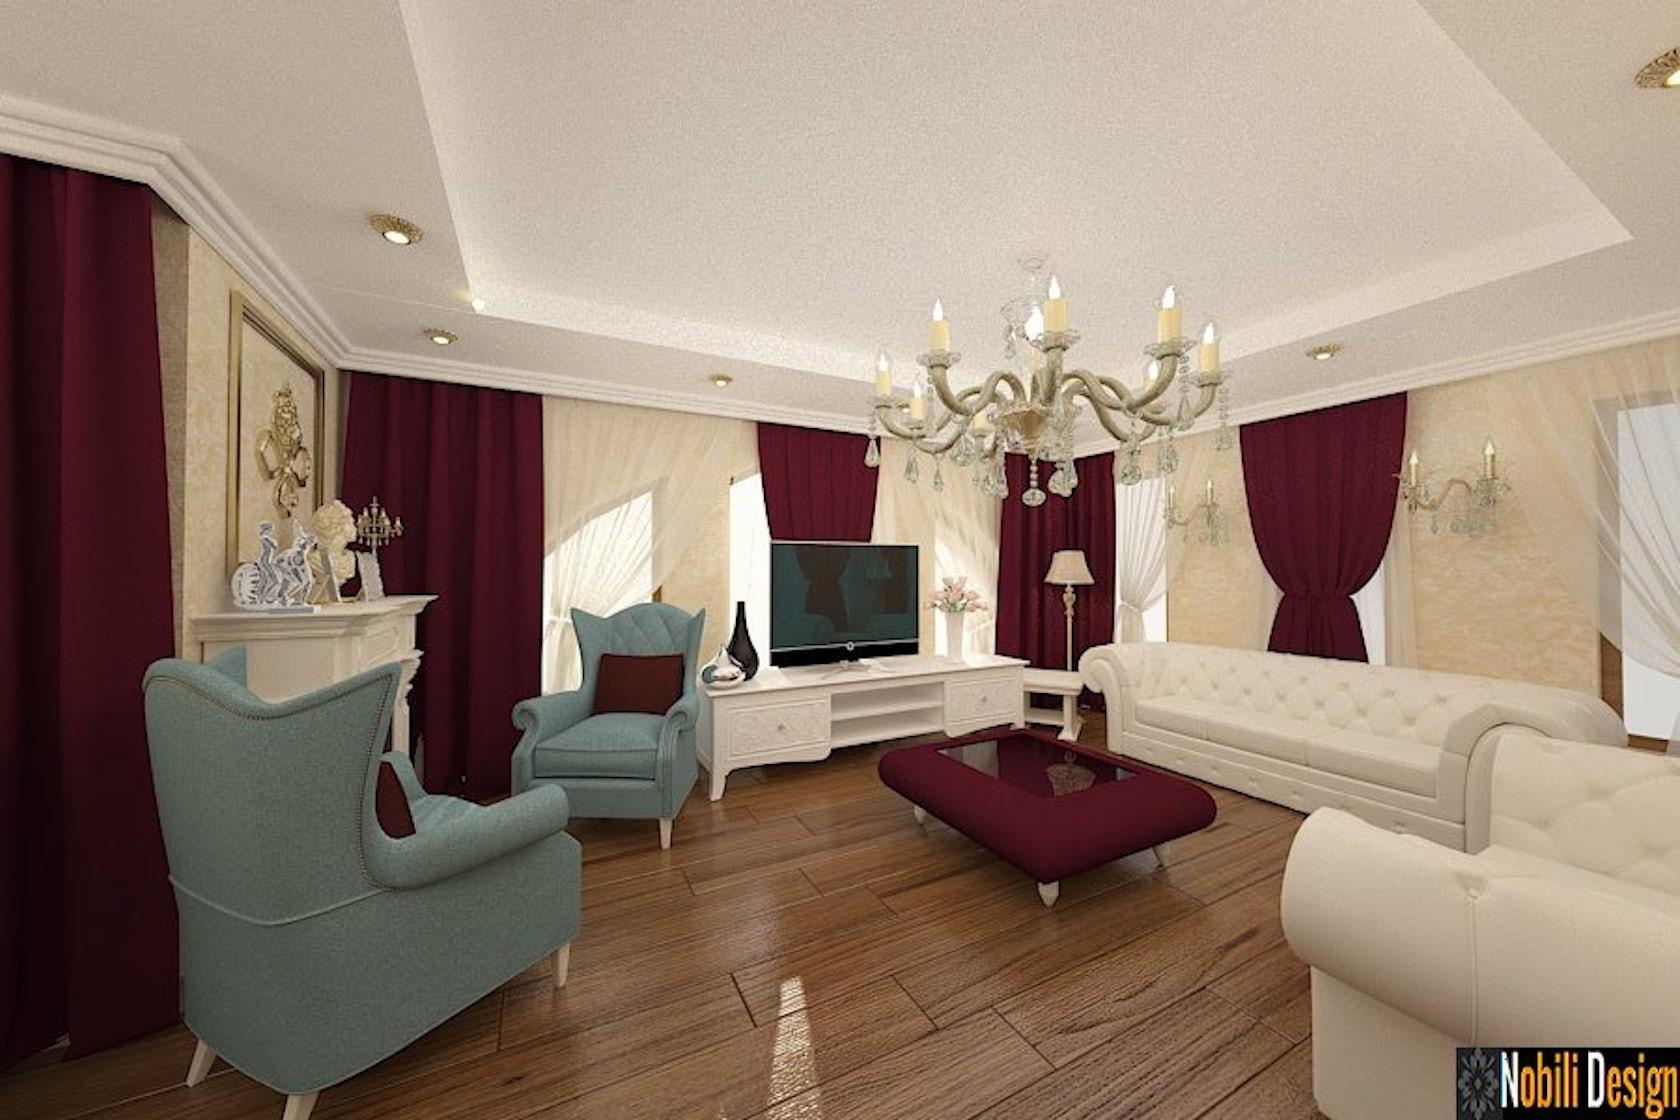 Interior design luxury classic house on Architizer